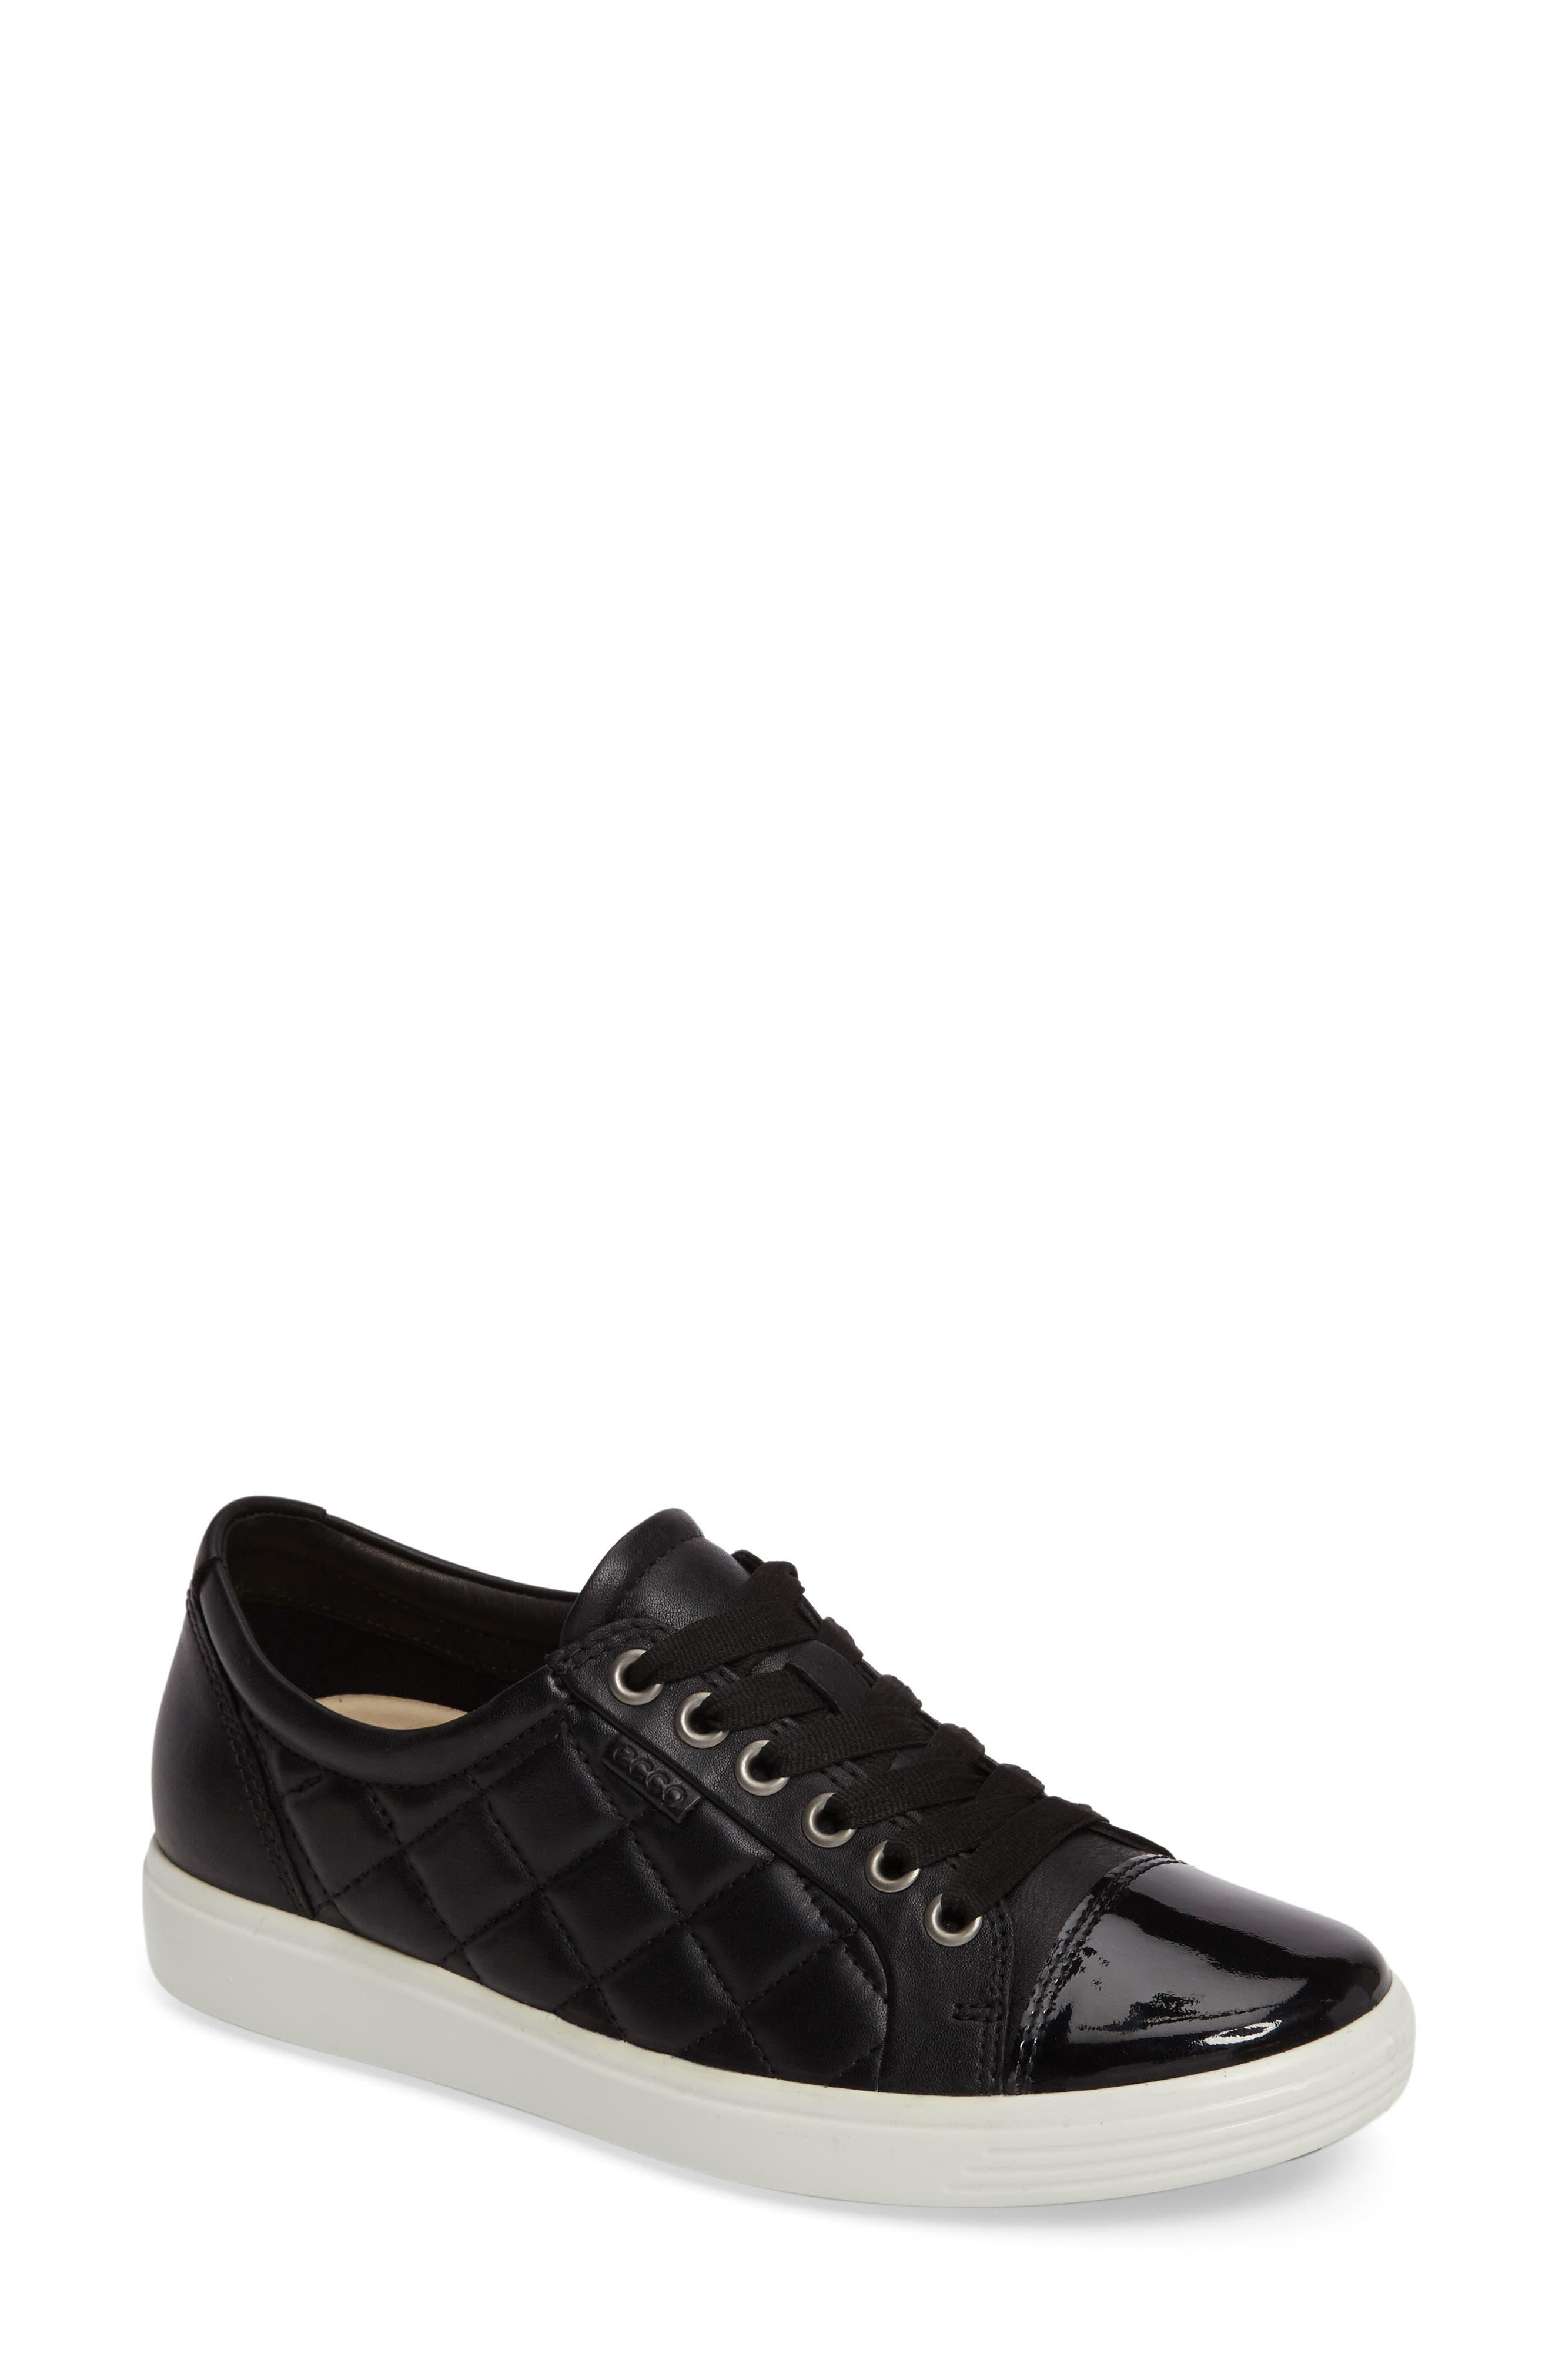 Alternate Image 1 Selected - ECCO 'Soft 7' Sneaker (Women)